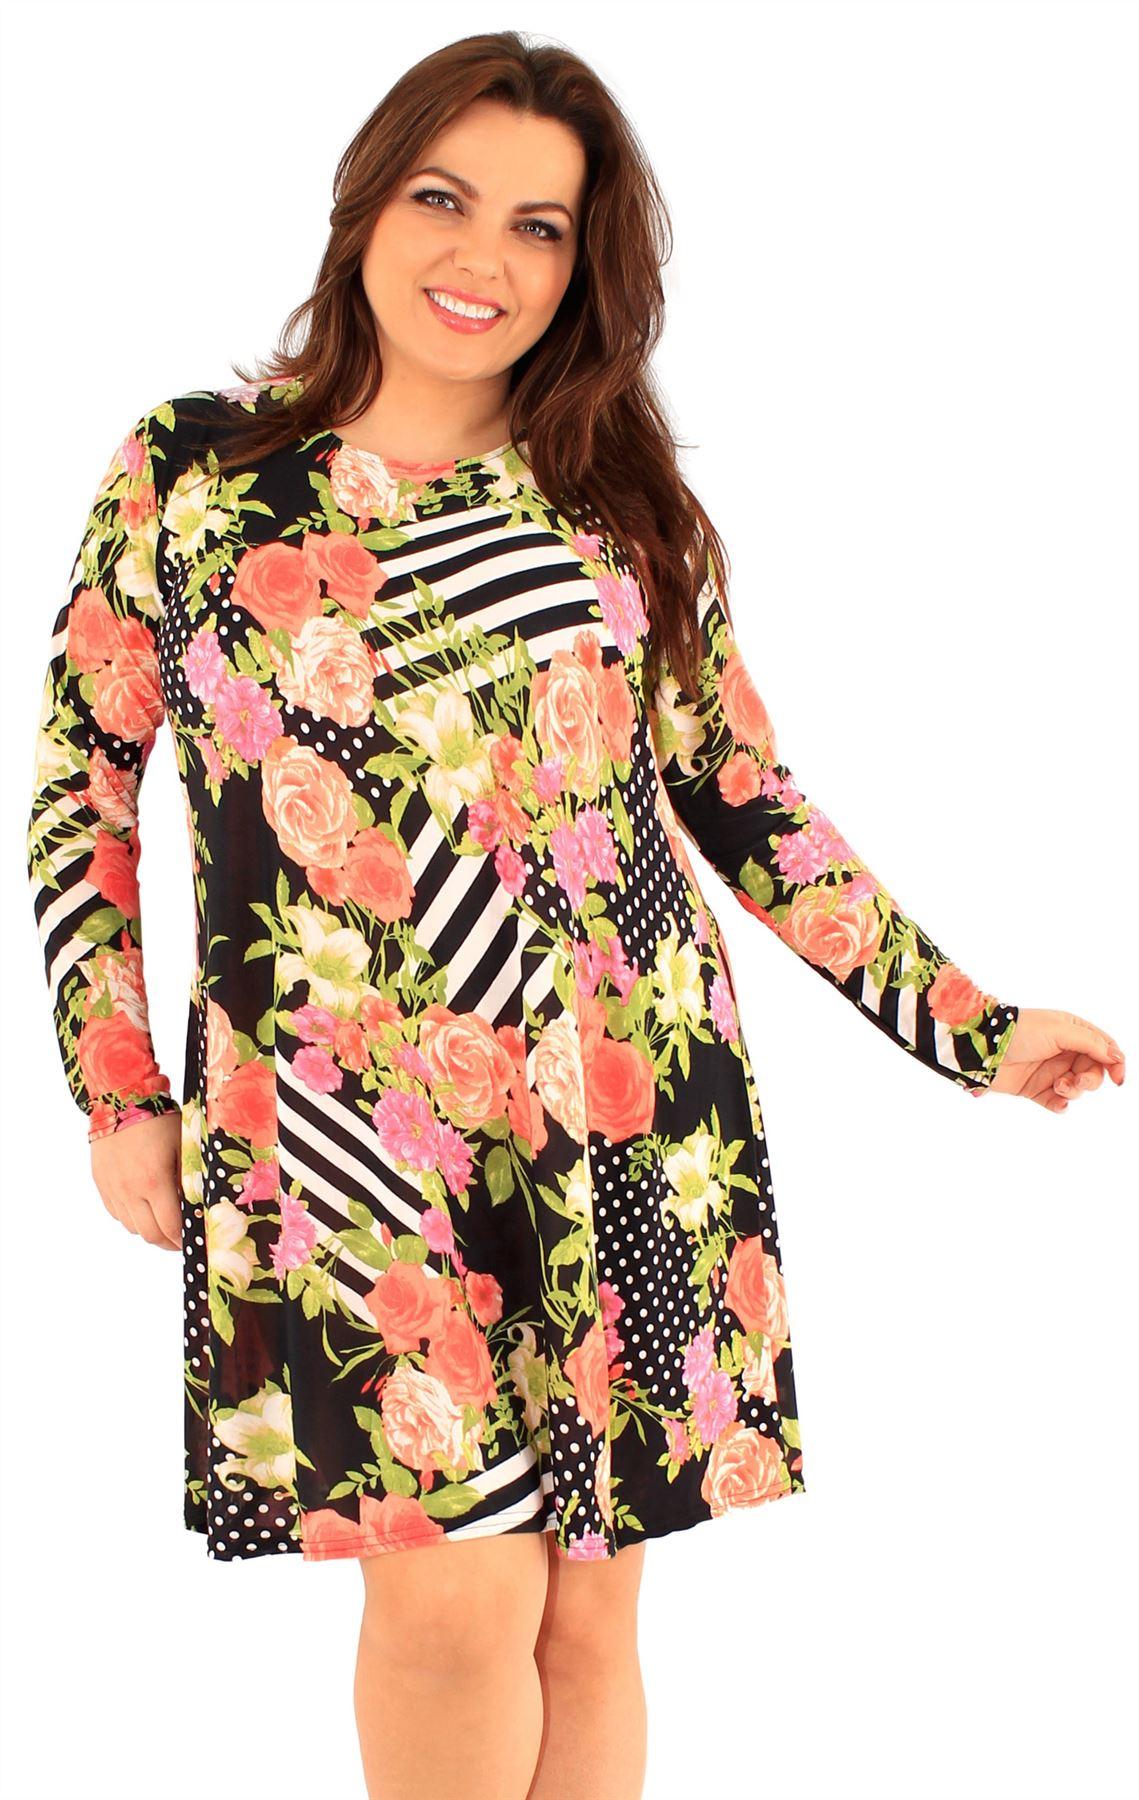 Vestido con flores manga larga